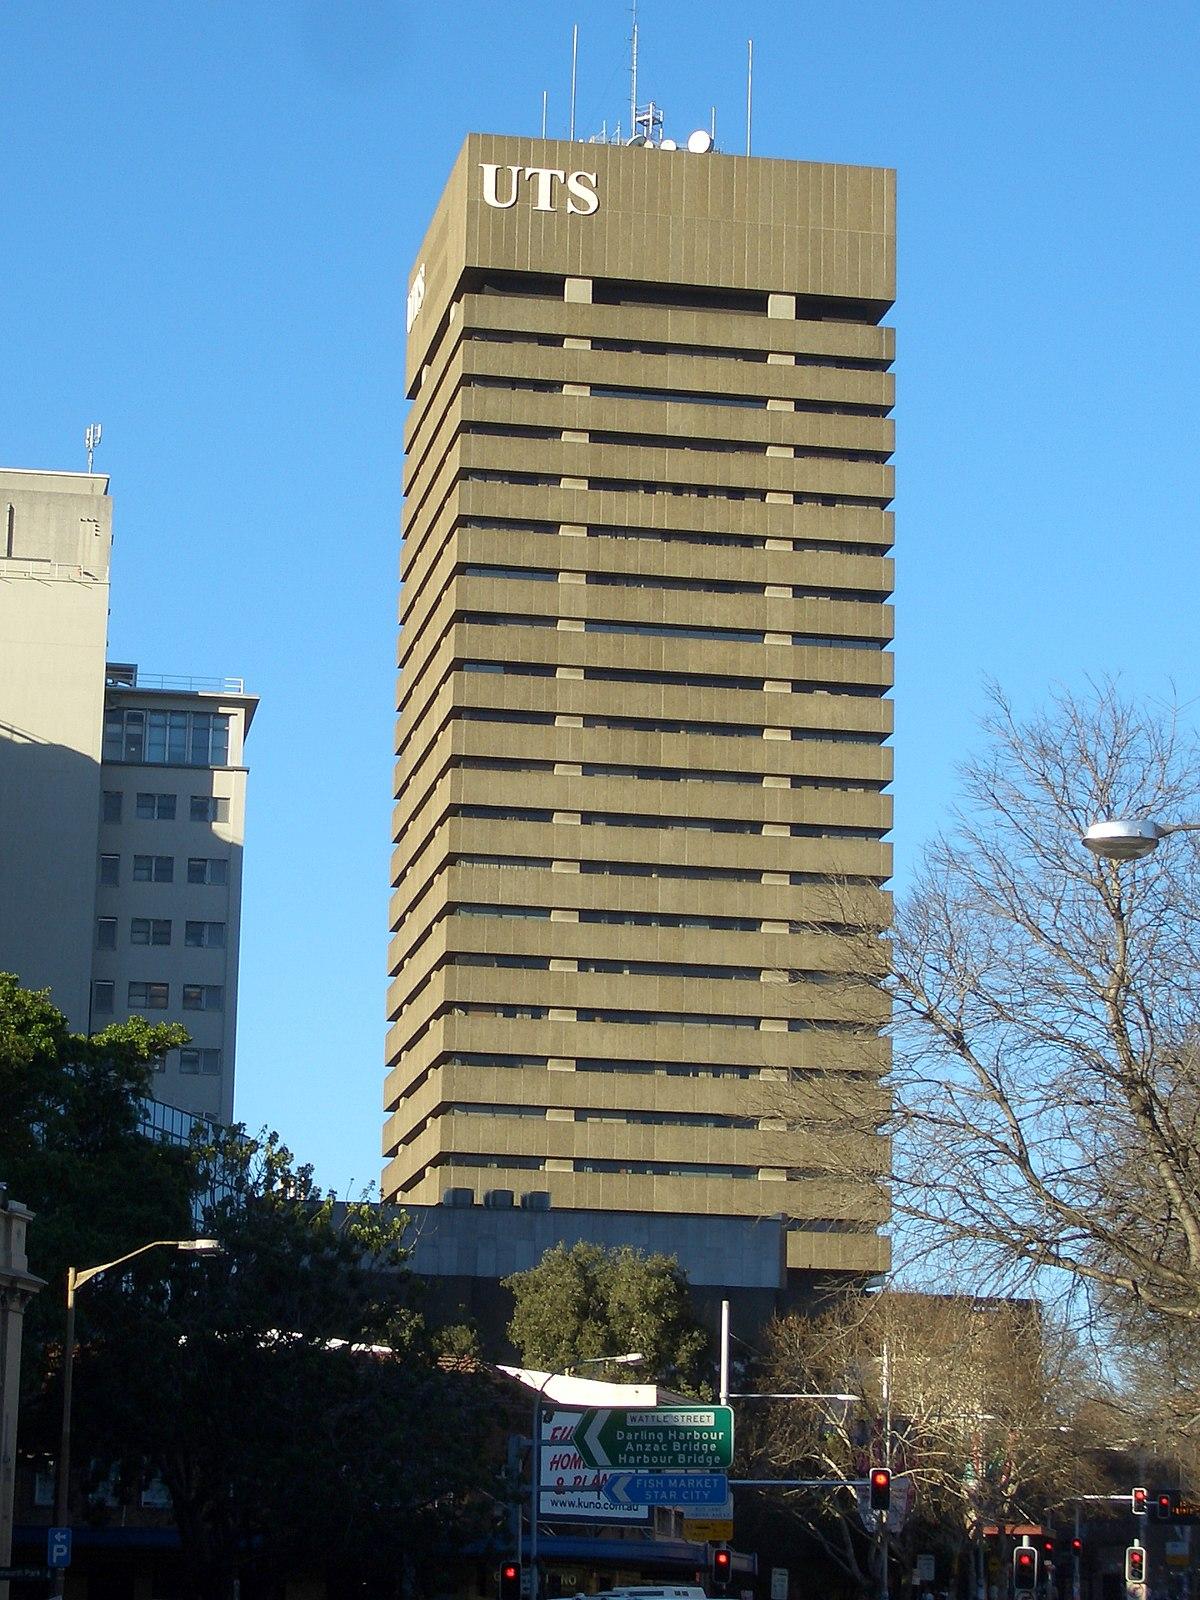 University Of Technology Sydney Wikidata